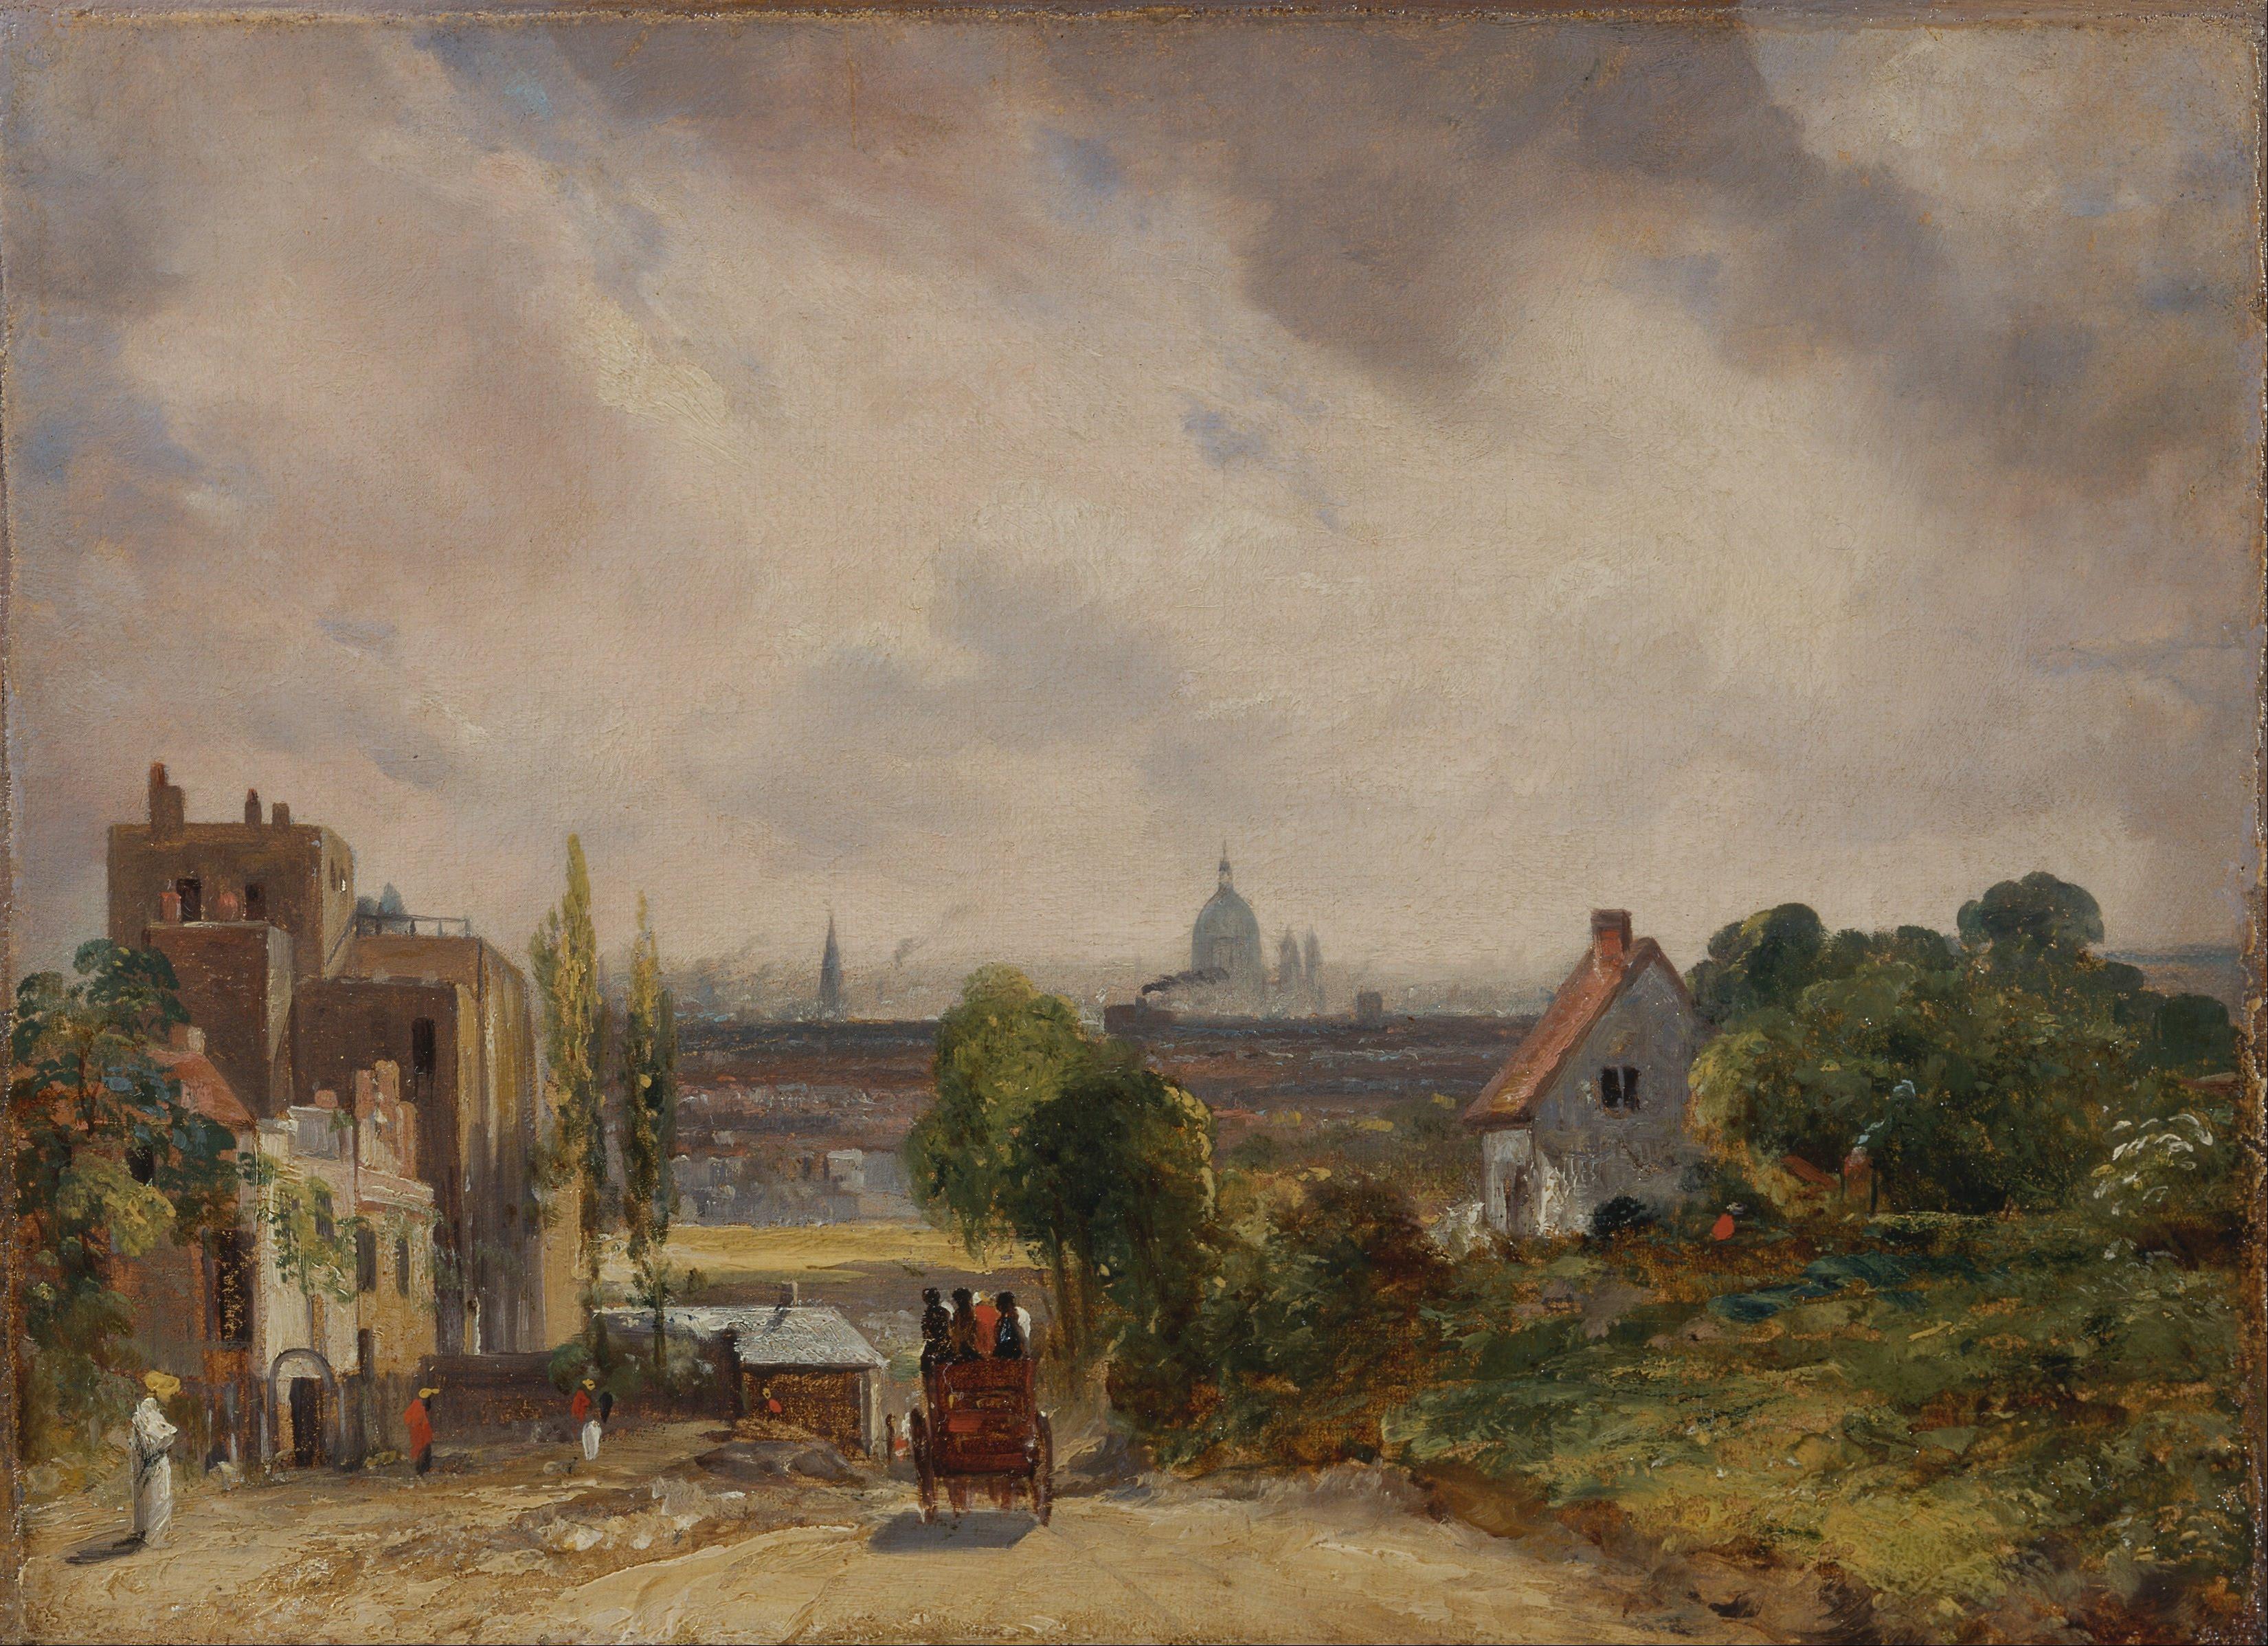 File:John Constable - Sir Richard Steele's Cottage ...